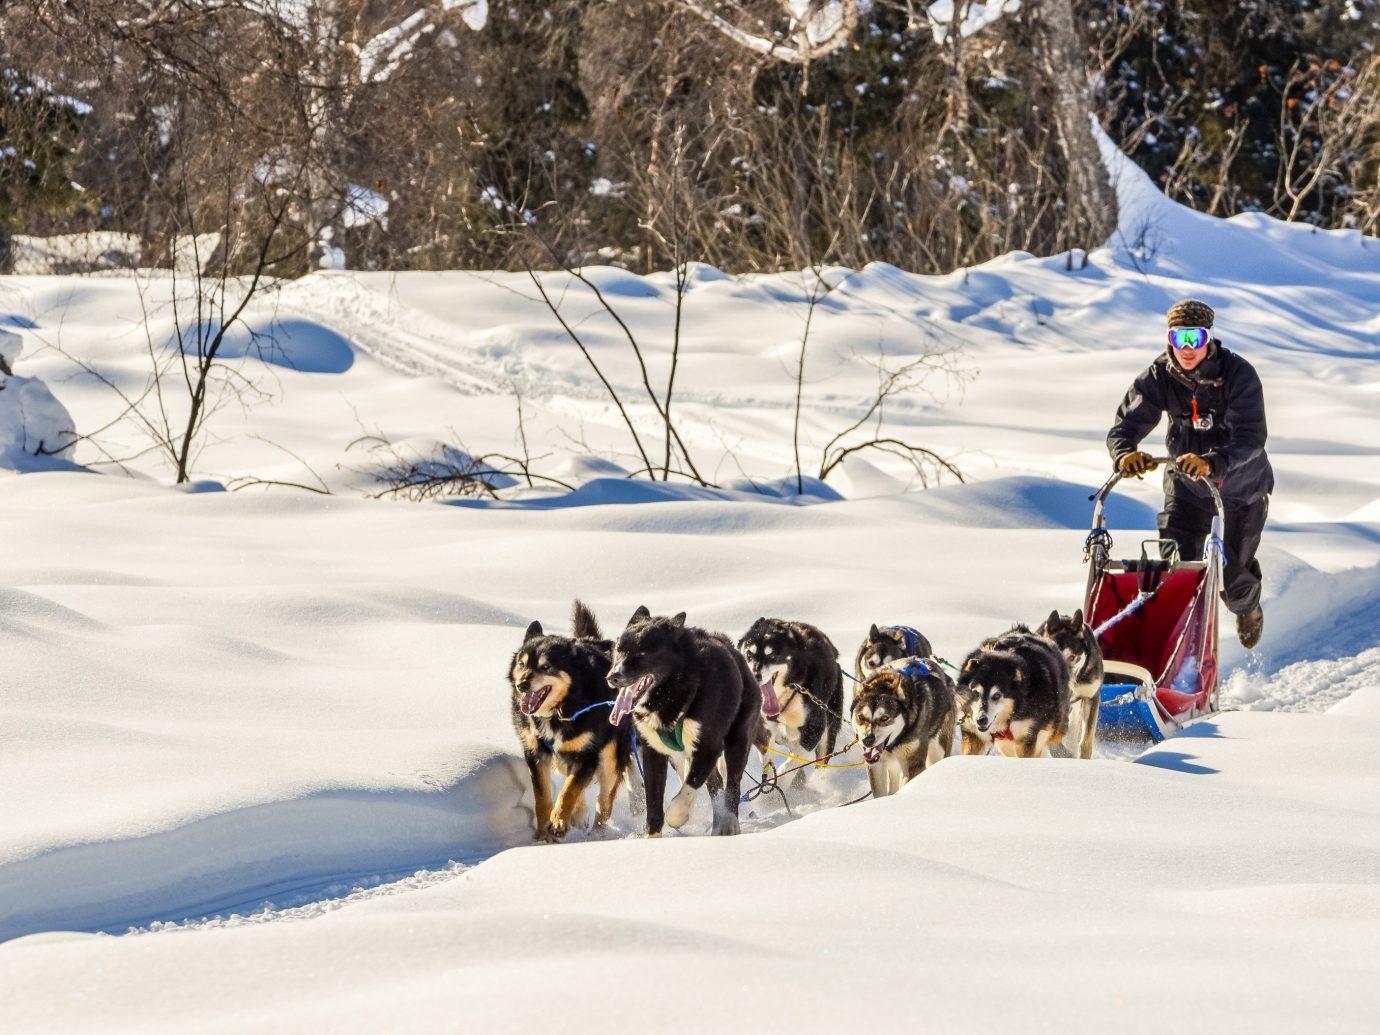 Trip Ideas snow outdoor tree transport skiing vehicle sled land vehicle mushing dog sled Winter sled dog racing Dog season sled dog dog like mammal nordic skiing